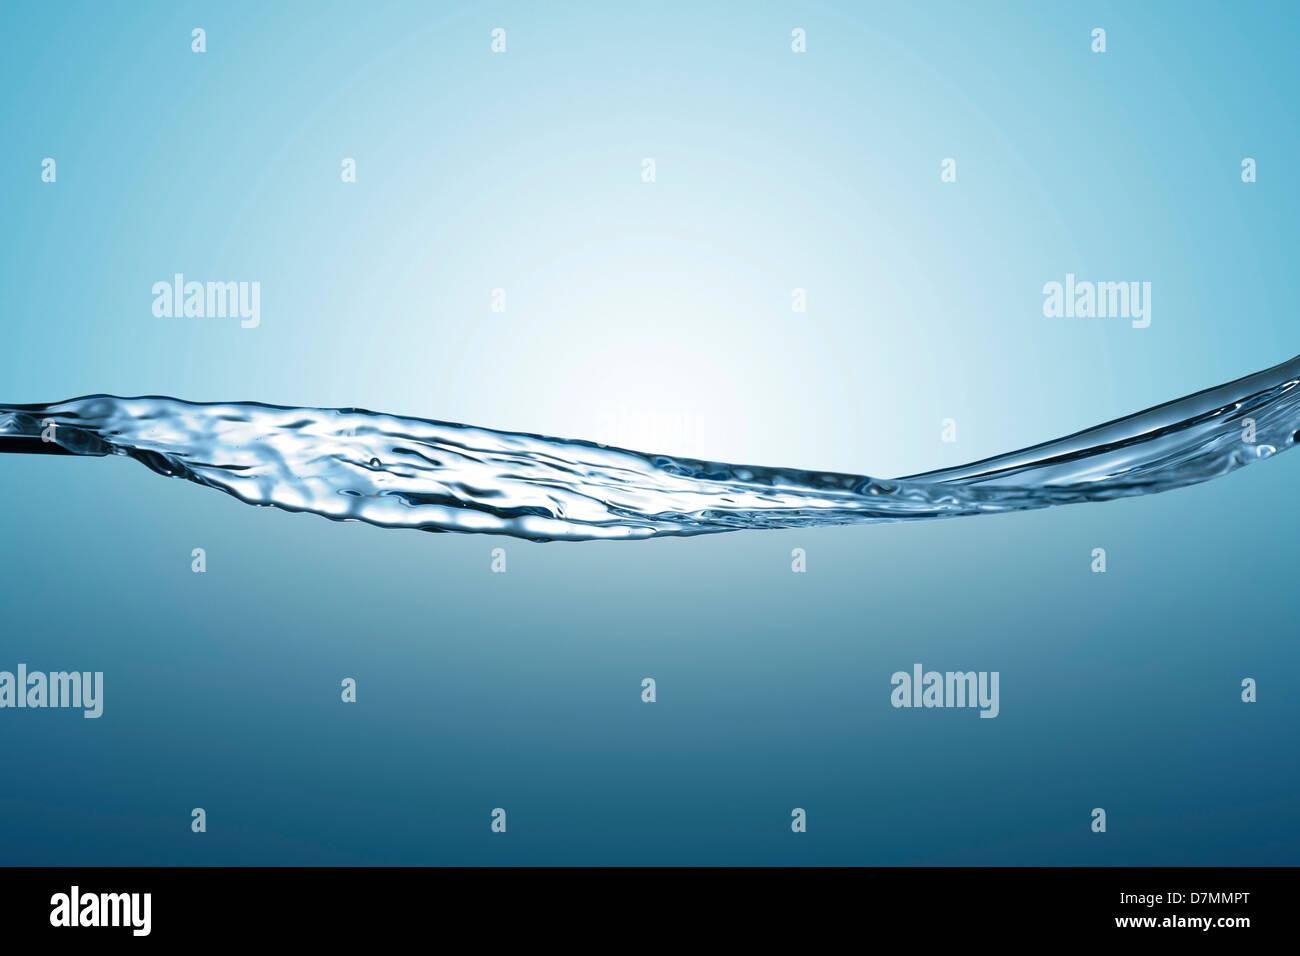 Wave Stockbild